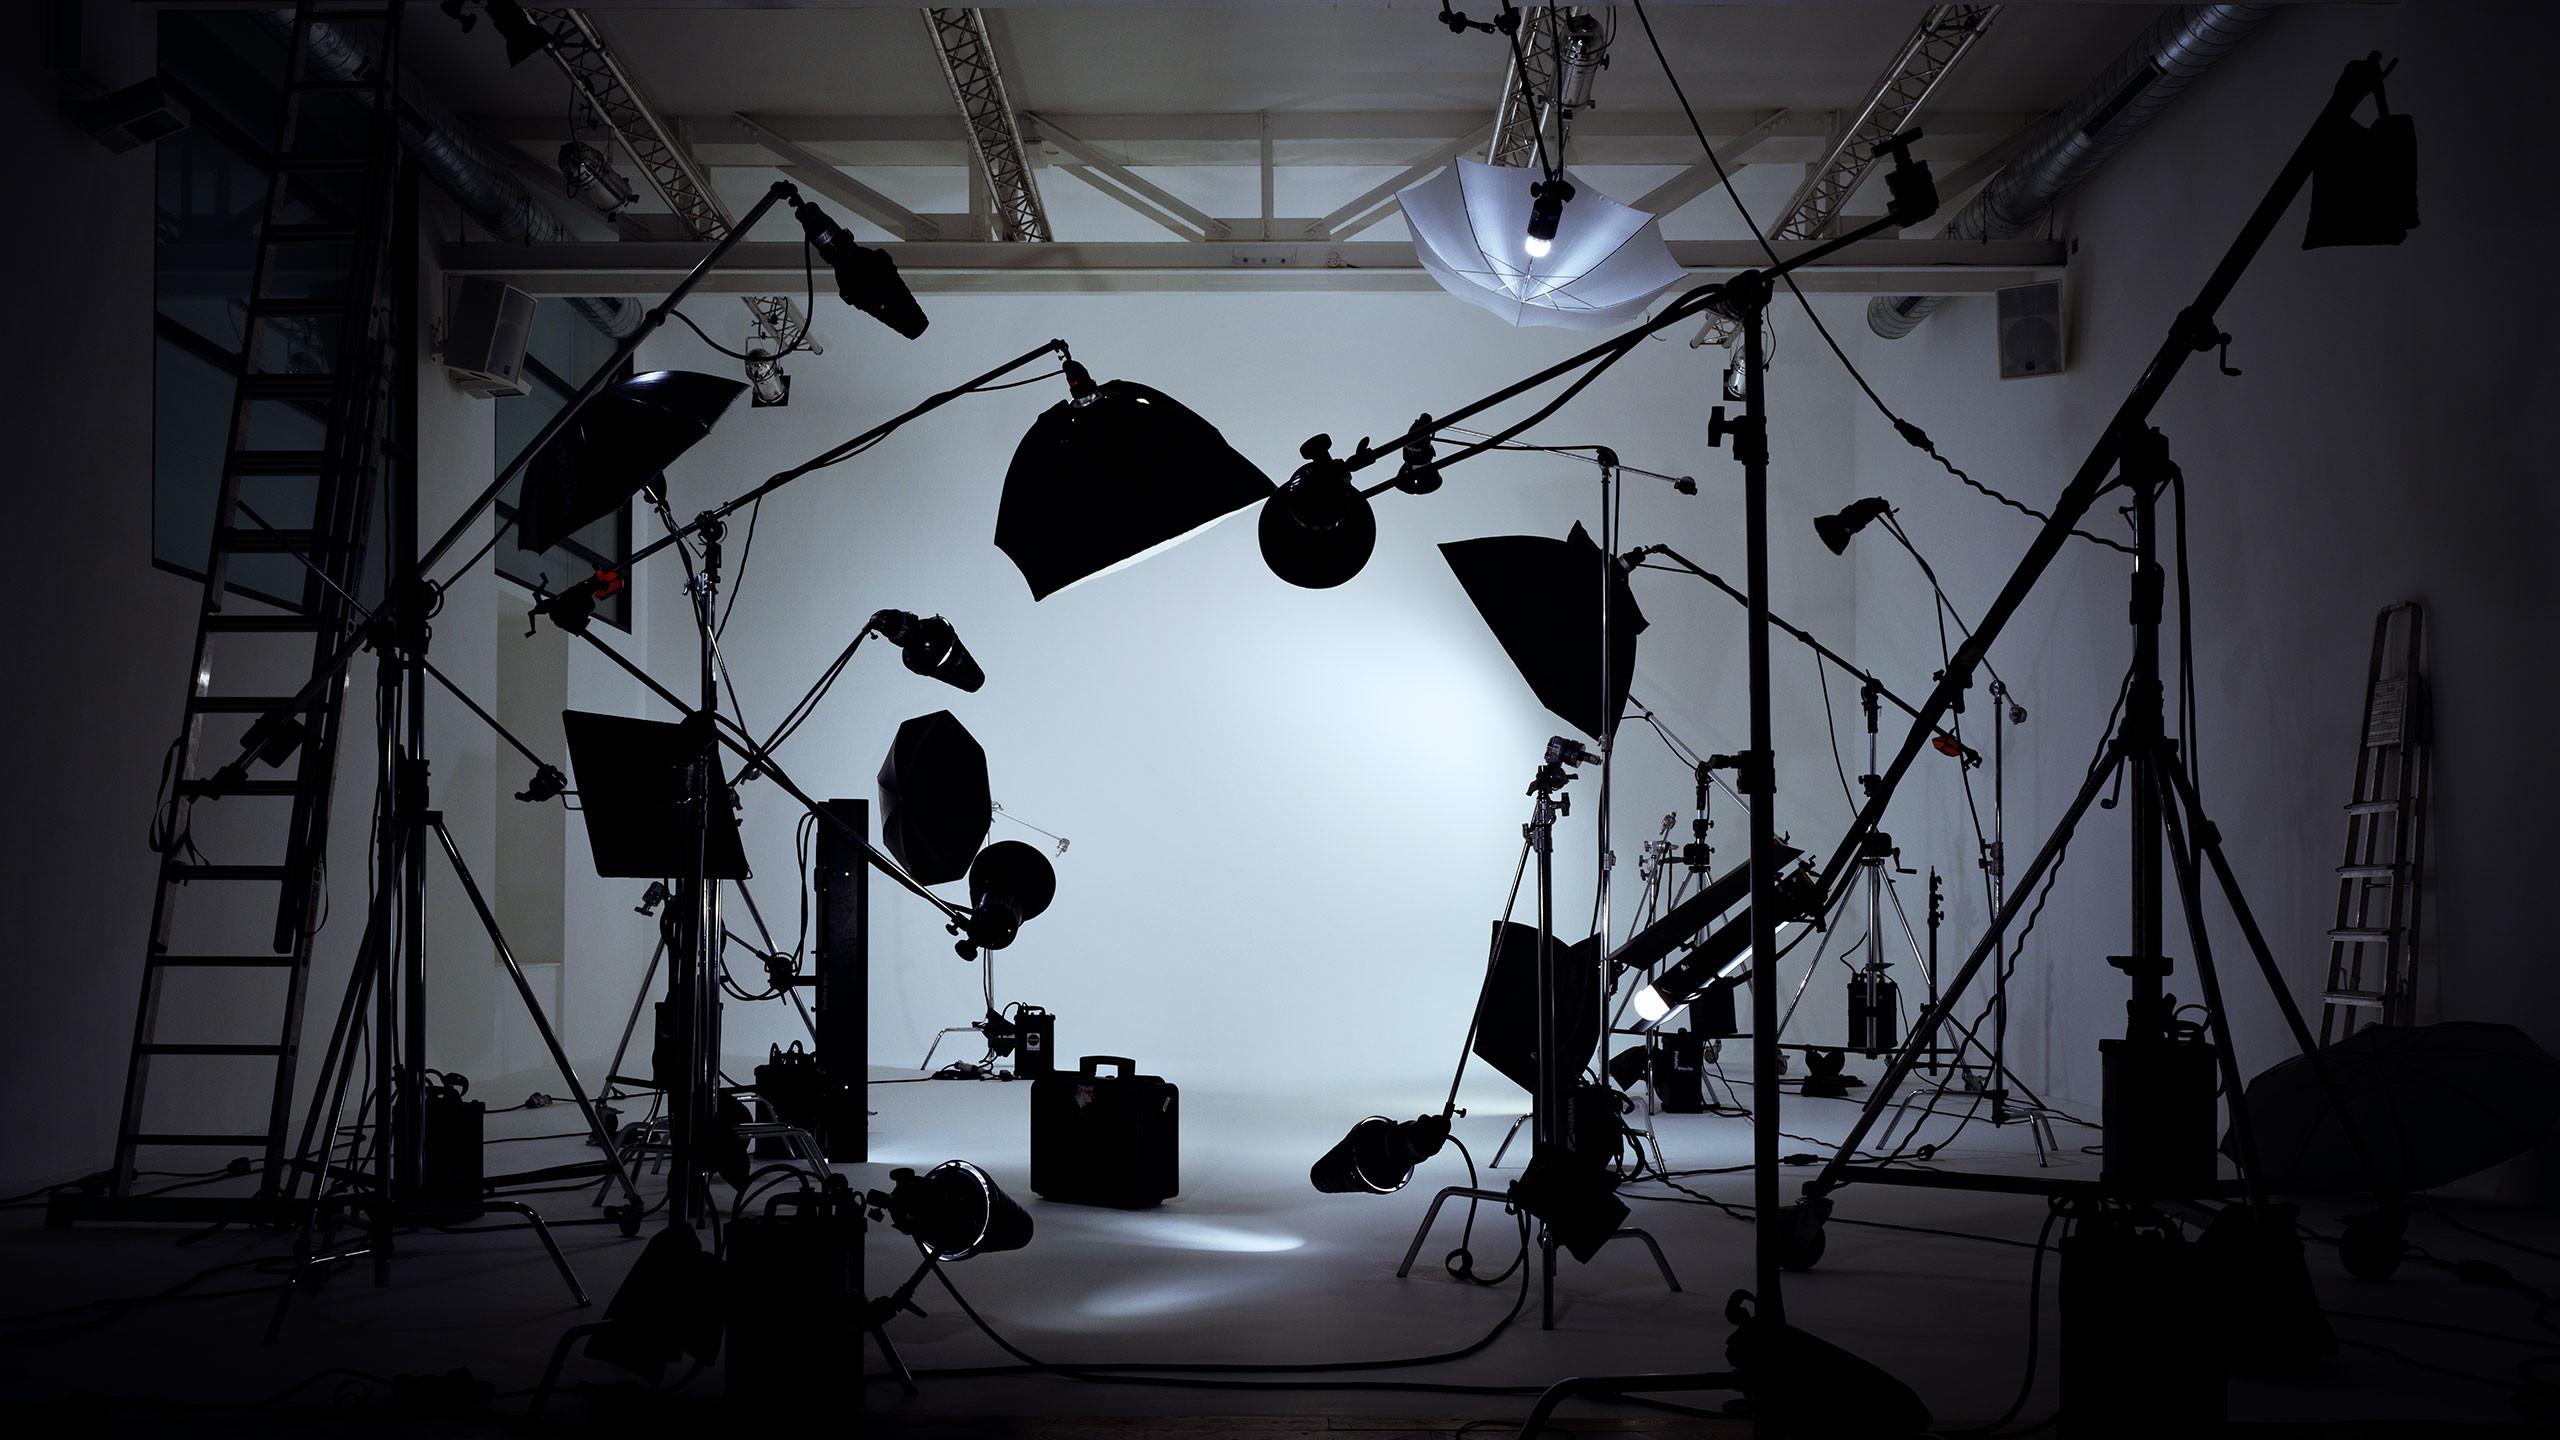 Filmmaking wallpaper 82 images - Set video as wallpaper ...